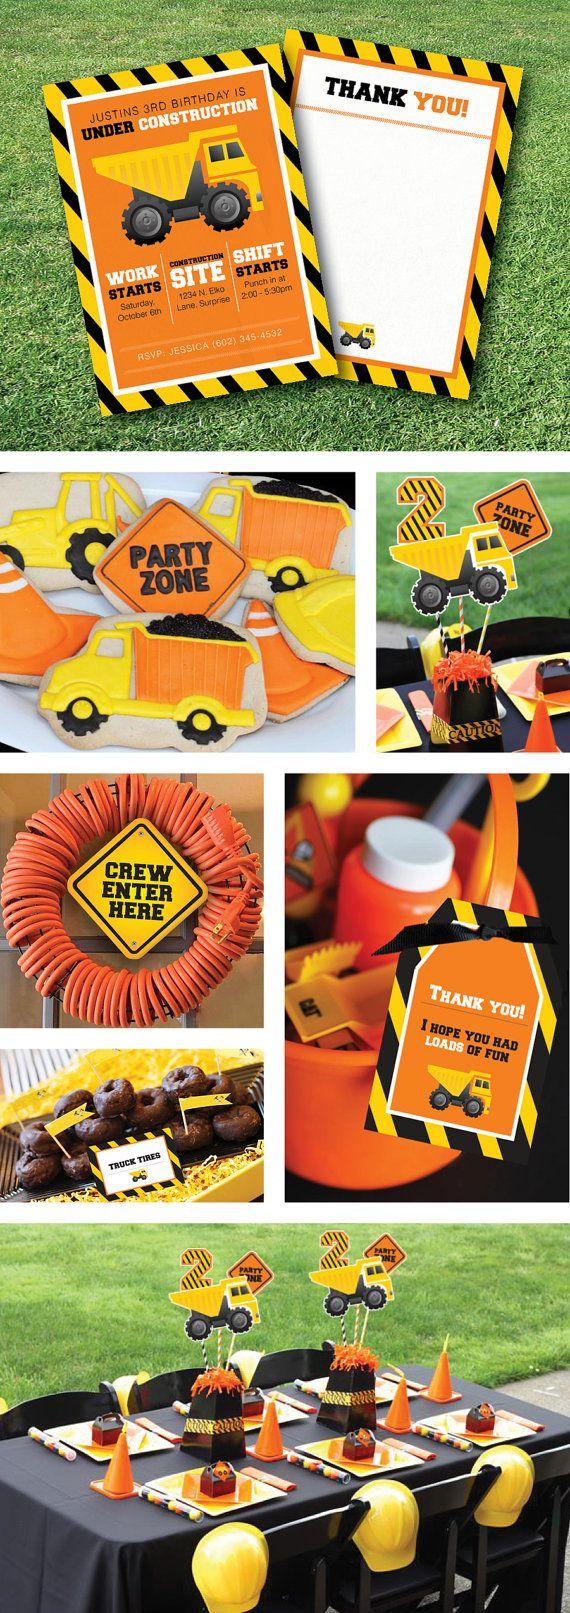 Under Construction Birthday Party, Invitation by GardellaGlobal, $6.00